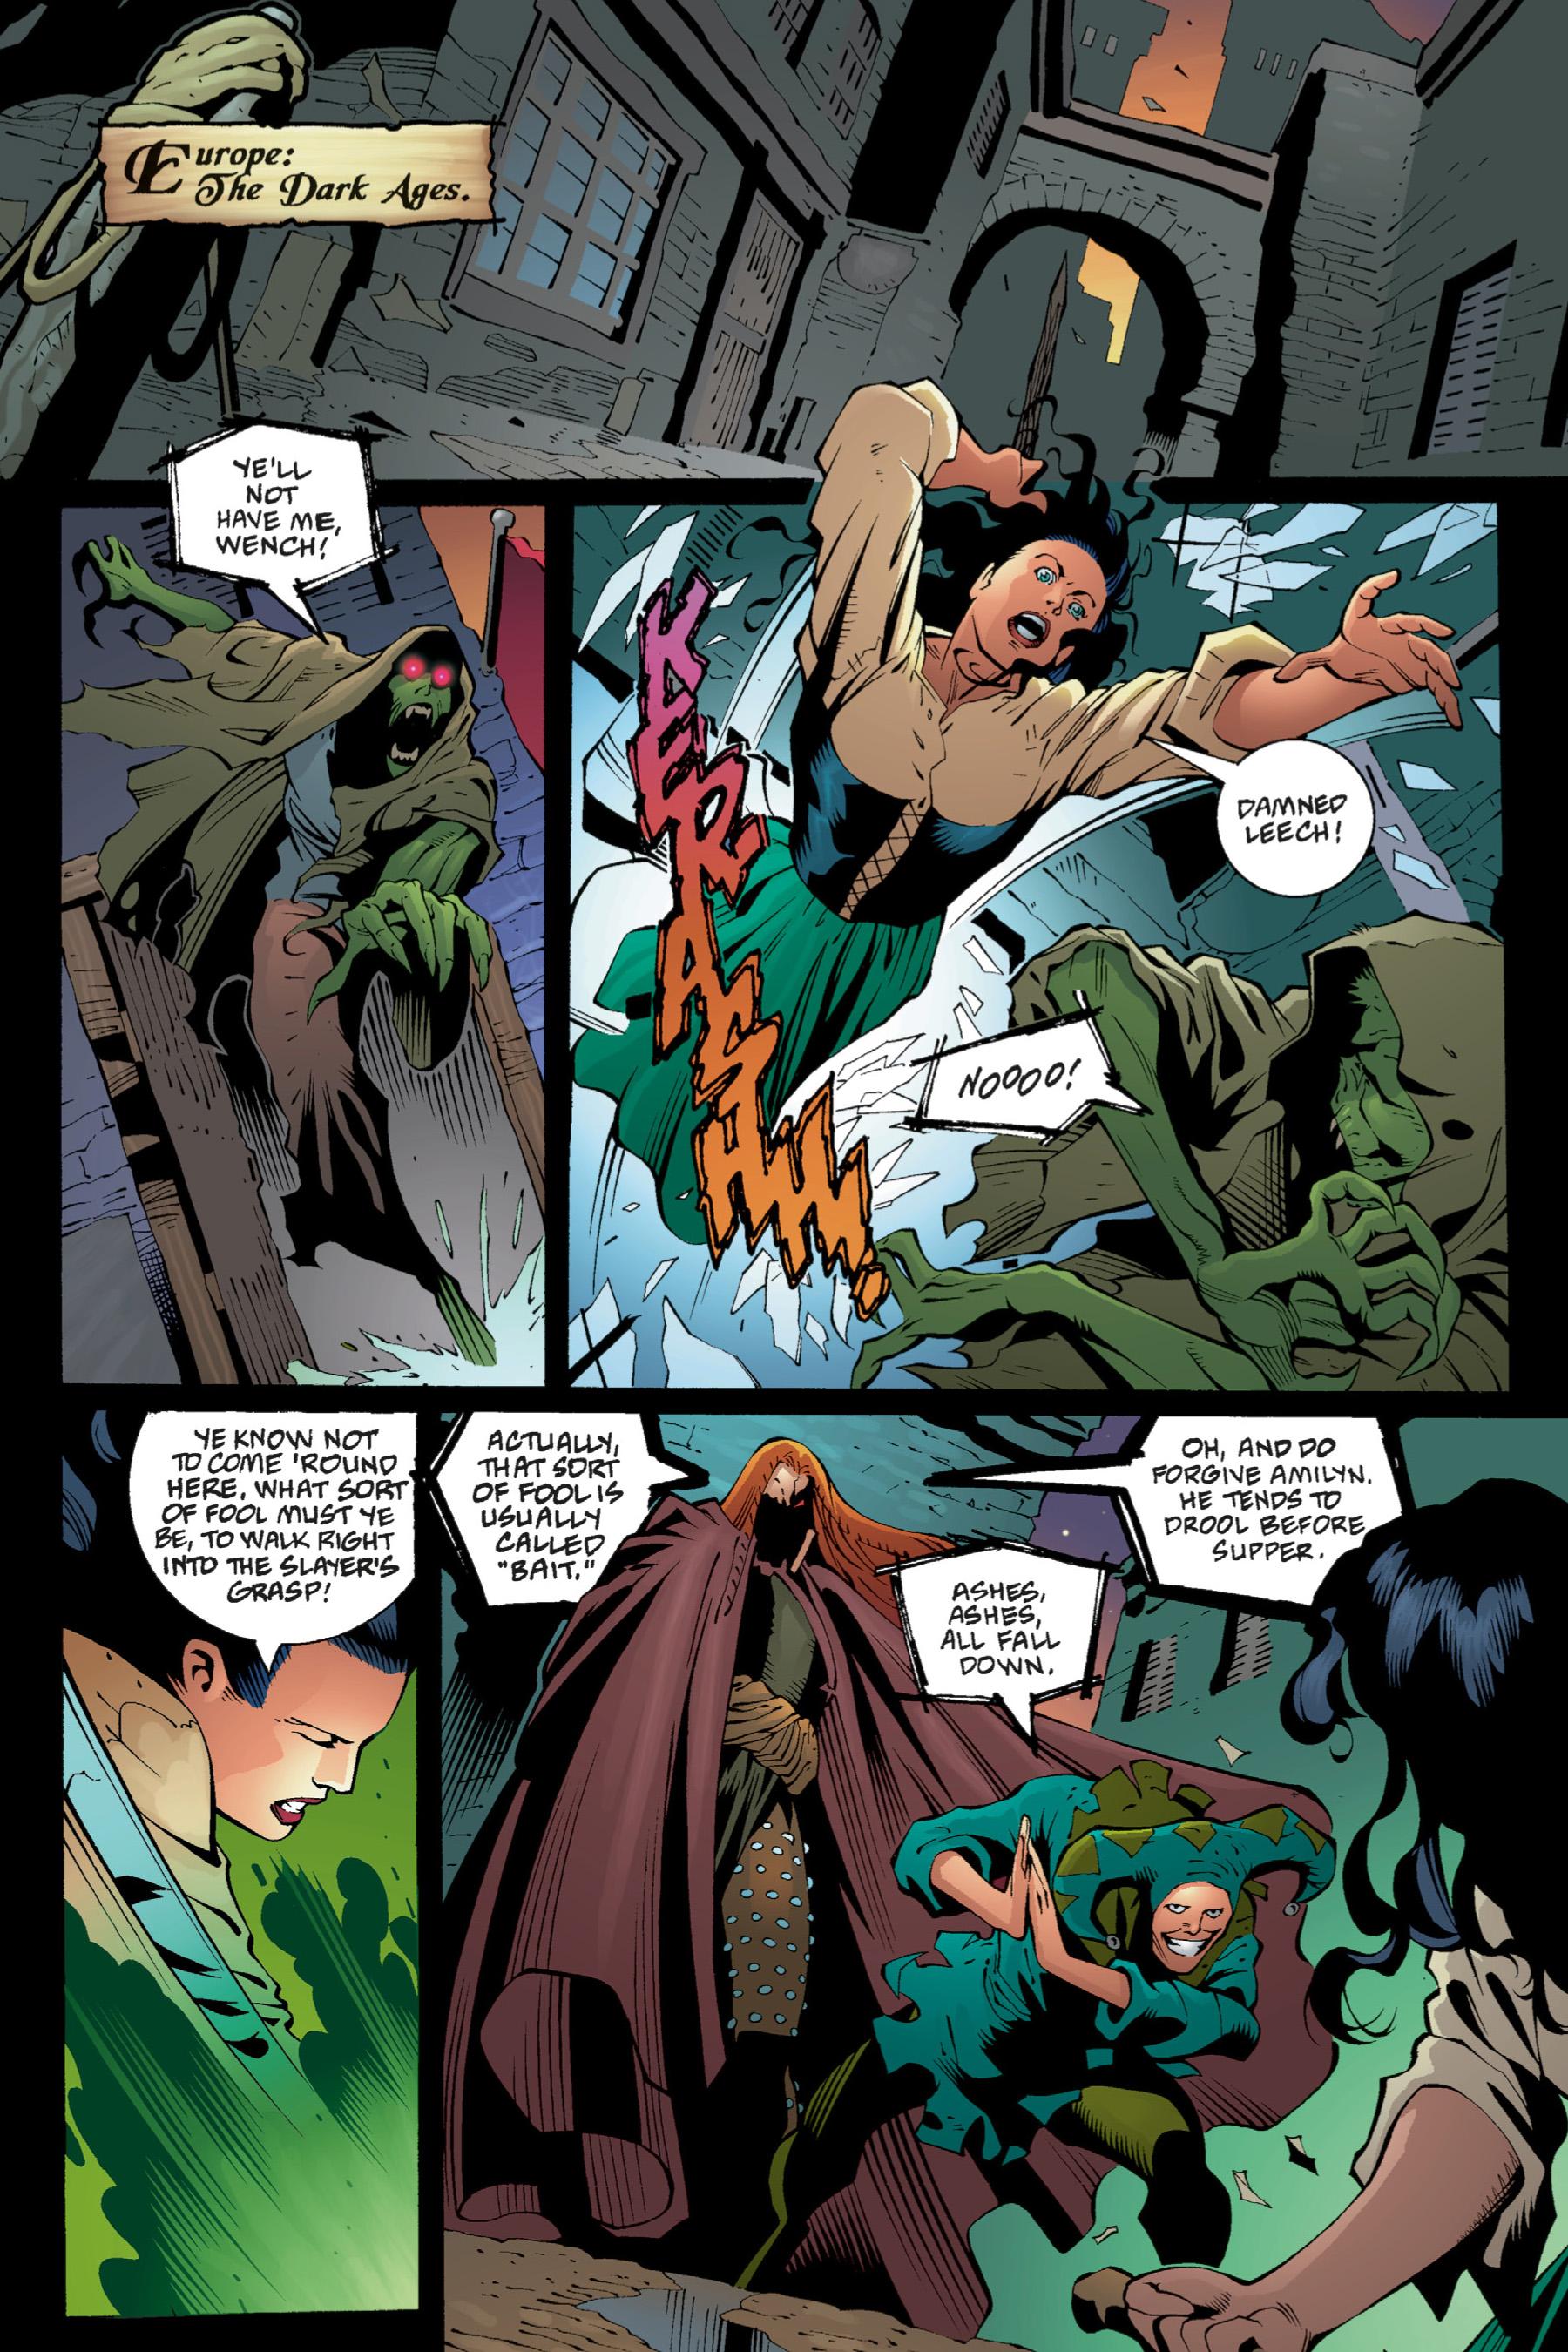 Read online Buffy the Vampire Slayer: Omnibus comic -  Issue # TPB 1 - 38